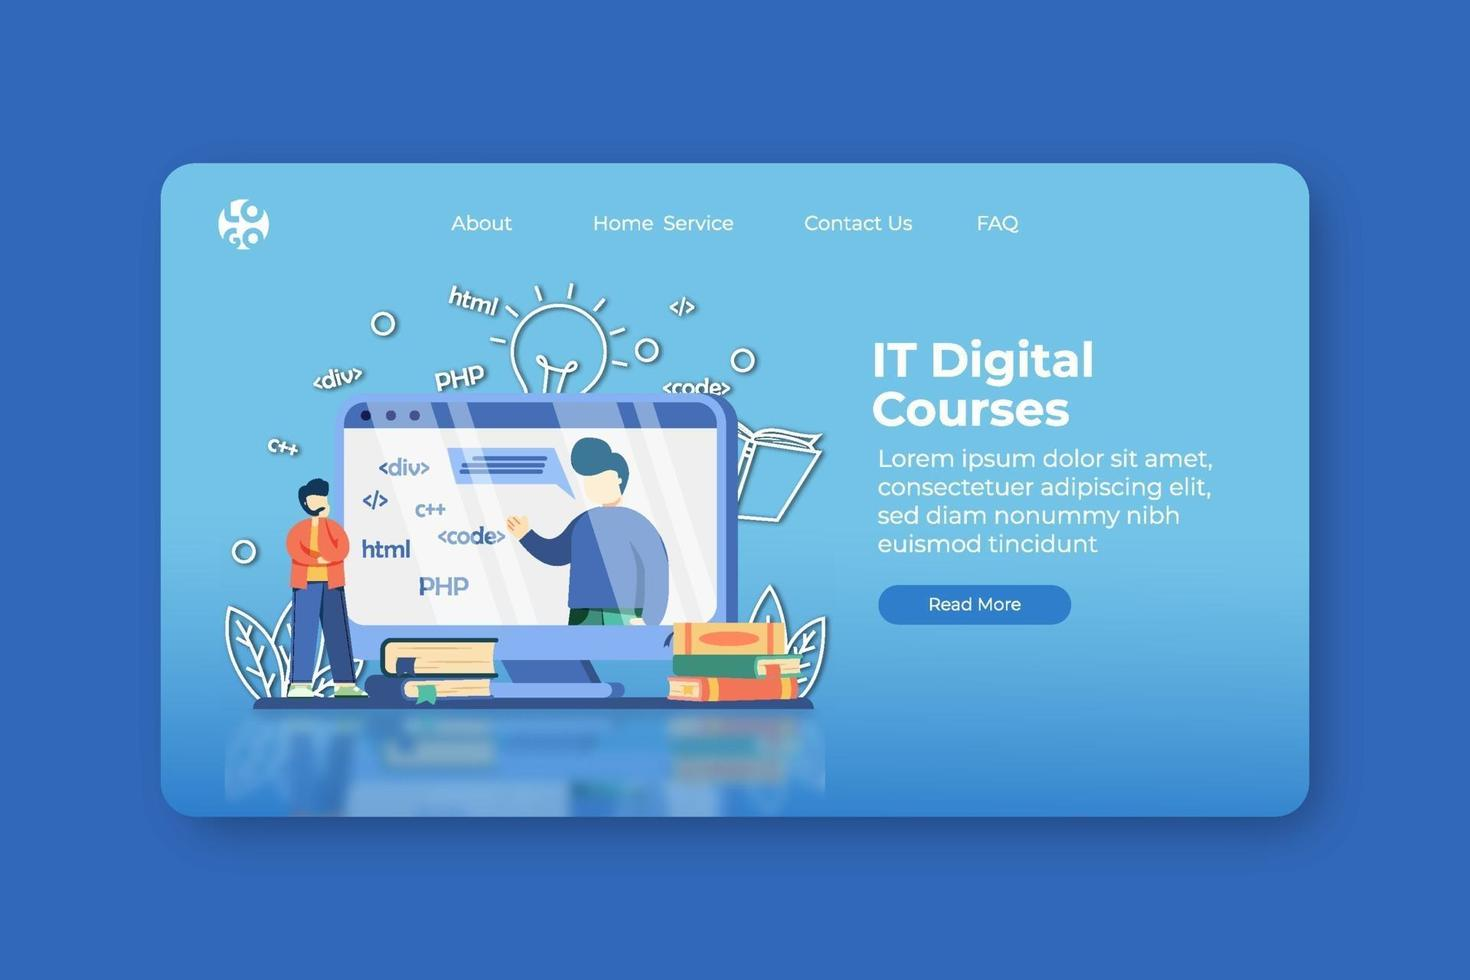 Modern flat design vector illustration. IT Digital Courses Landing Page and Web Banner Template. Training, Certification, Online Education, Webinar, Programming, Development app, Technology.